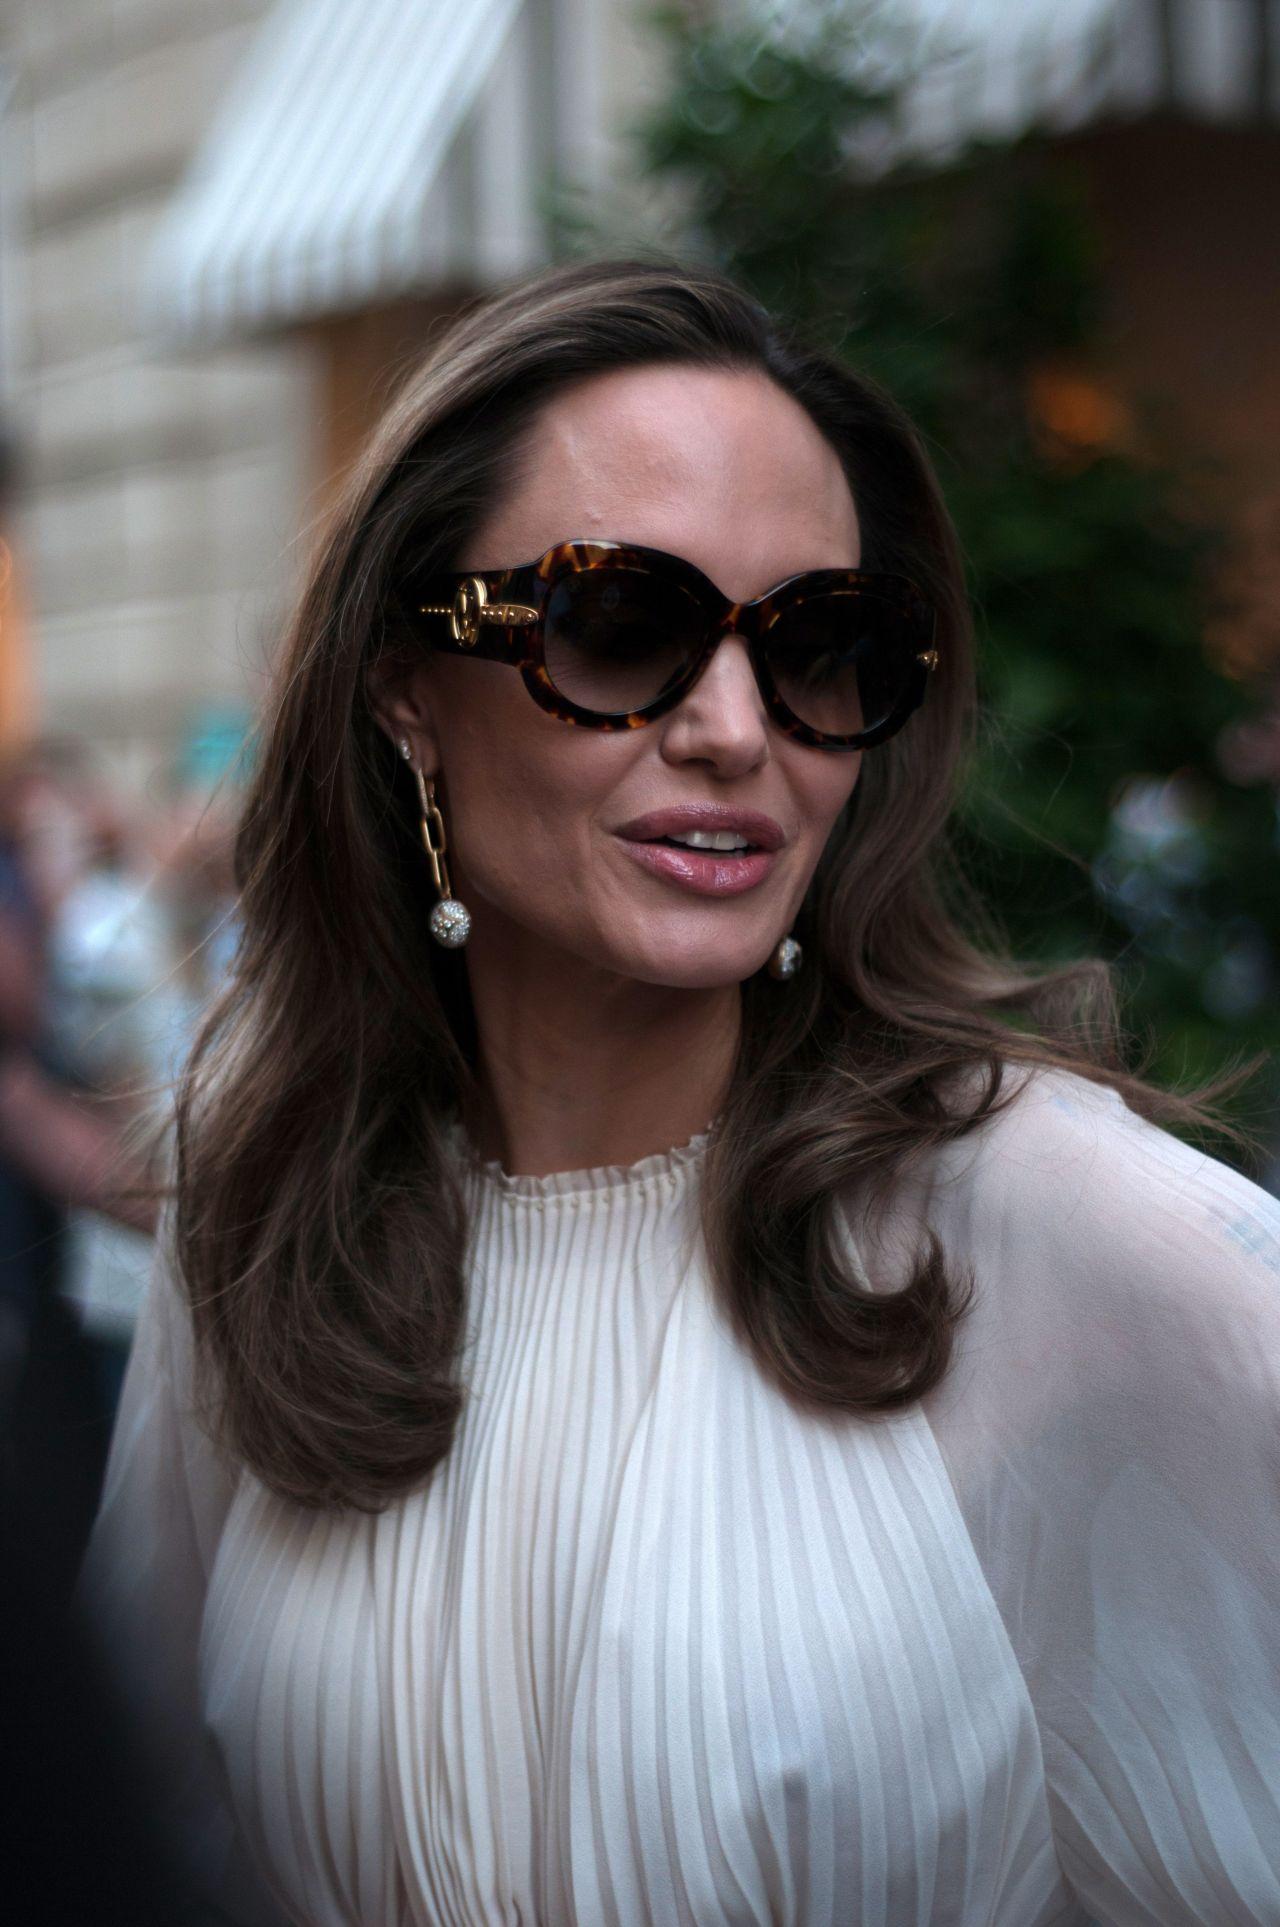 Angelina Jolie In Paris 07 08 2019